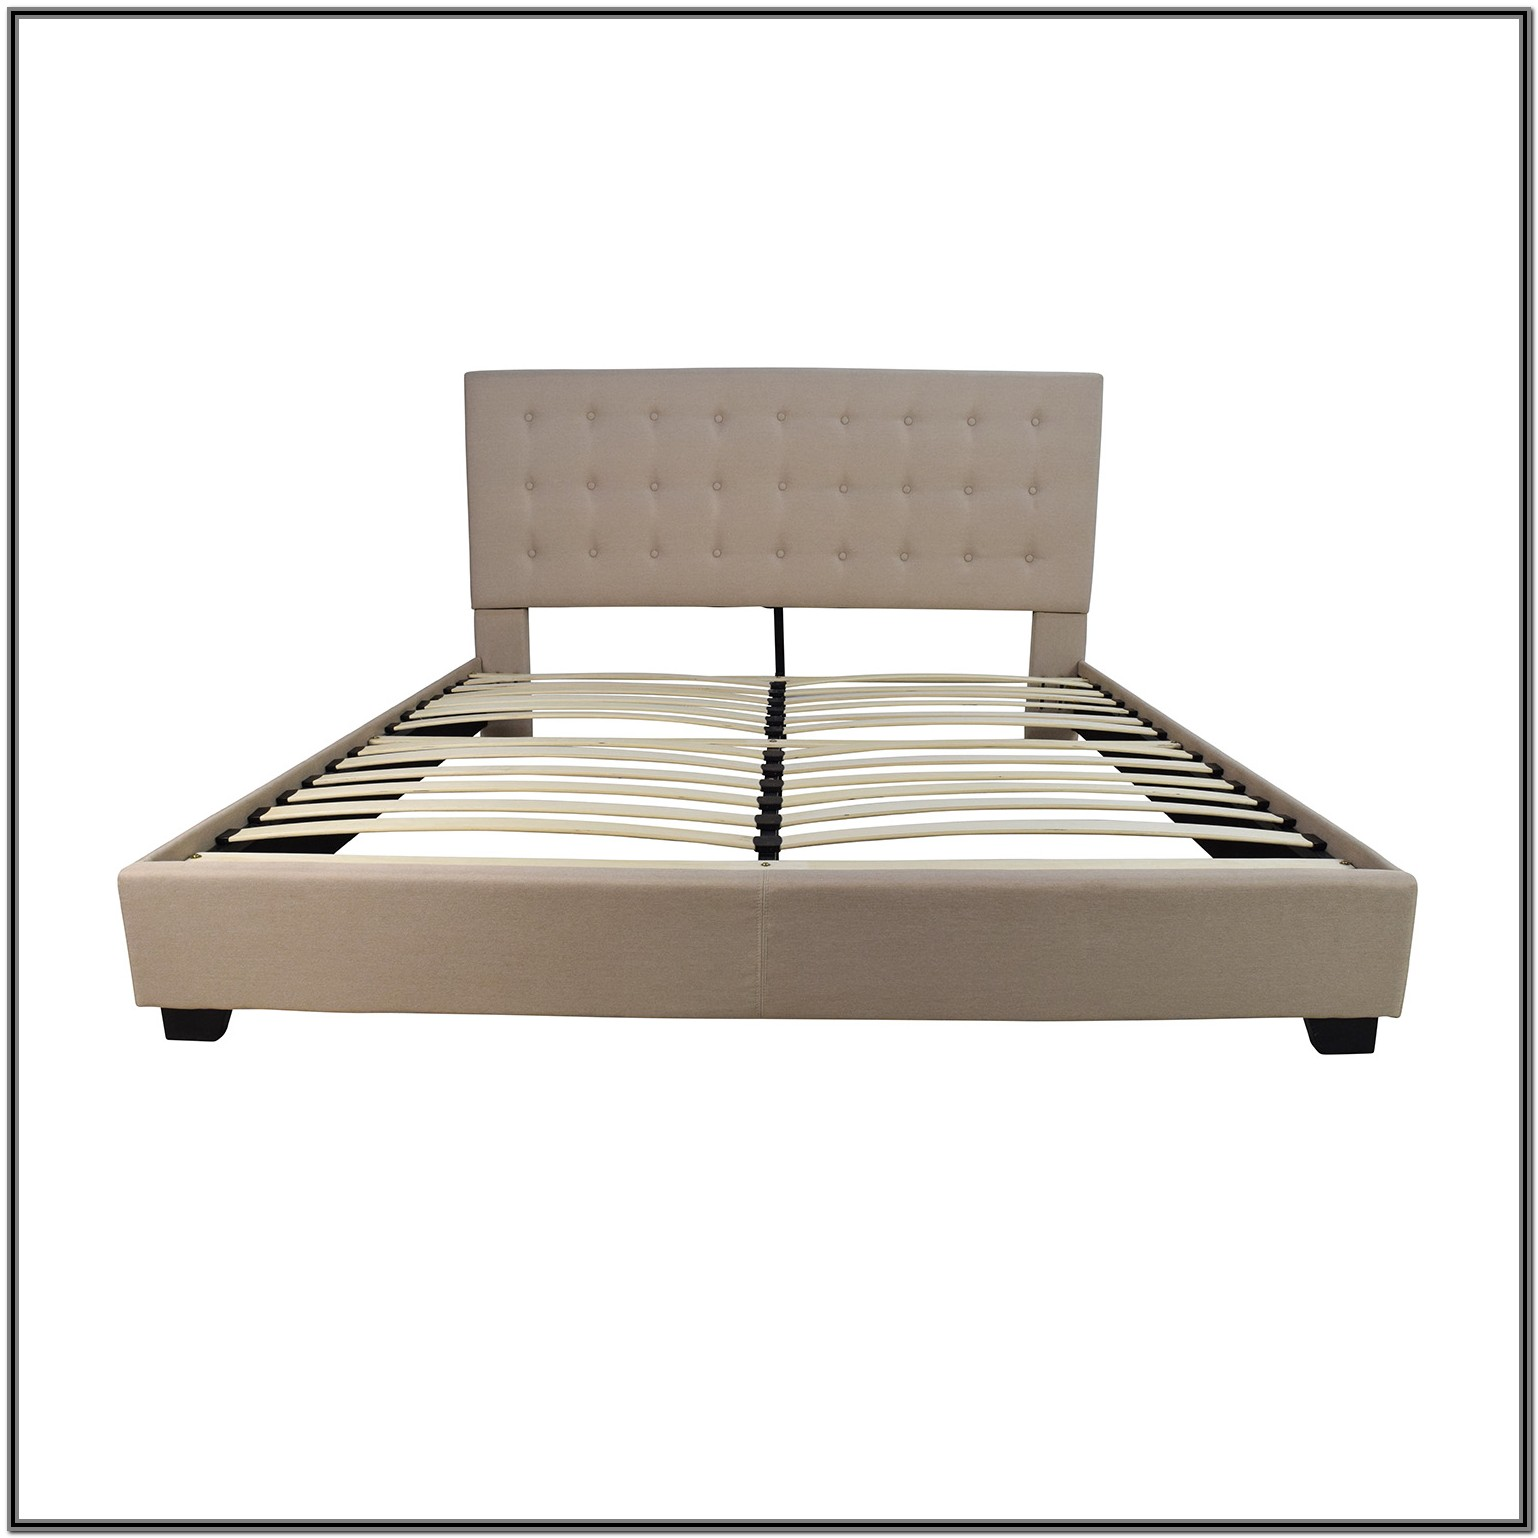 Ikea Malm King Size Bed Frame Uk